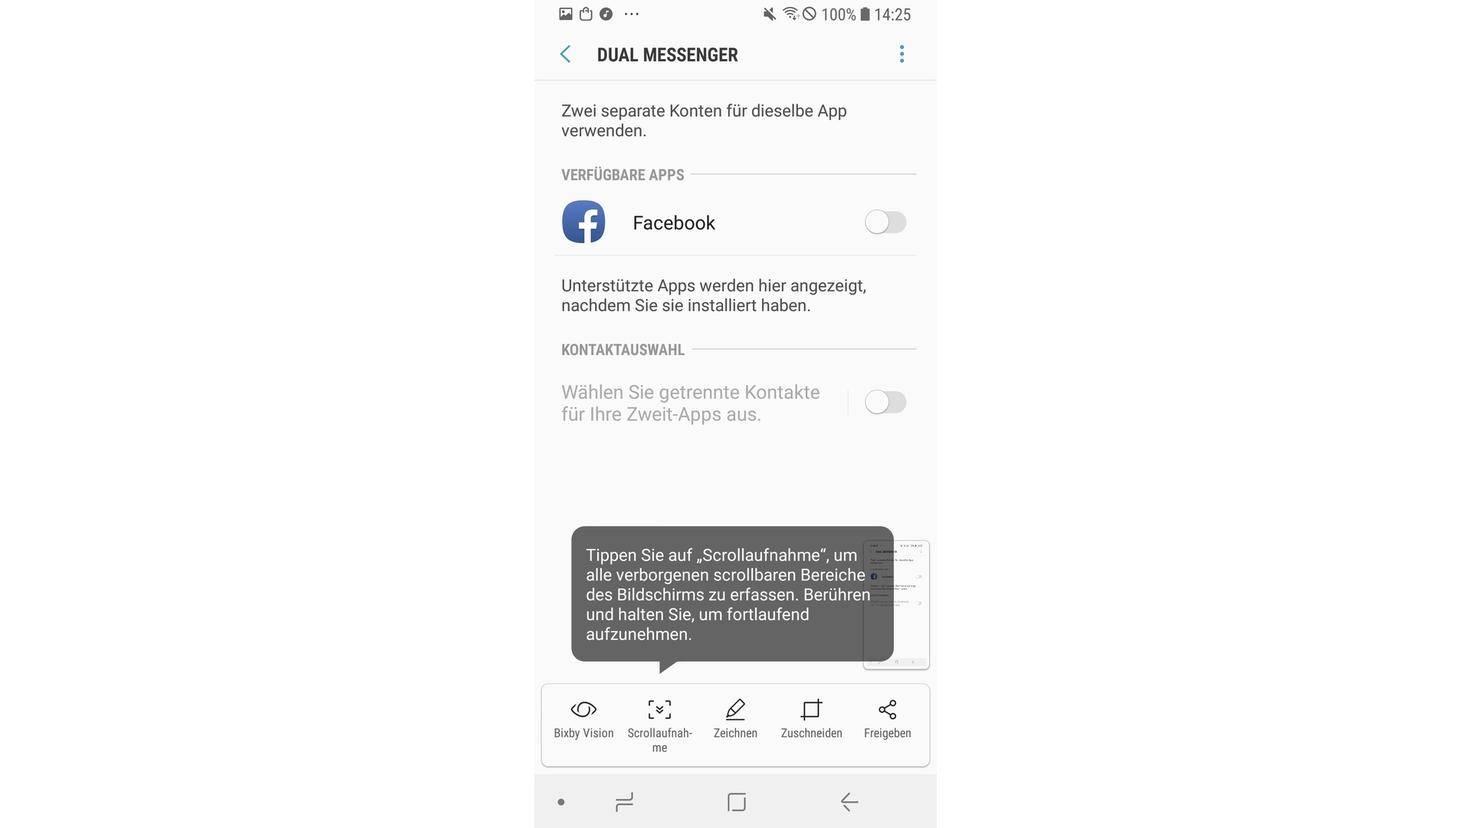 Samsung-Galaxy-A8-Dual-Messenger